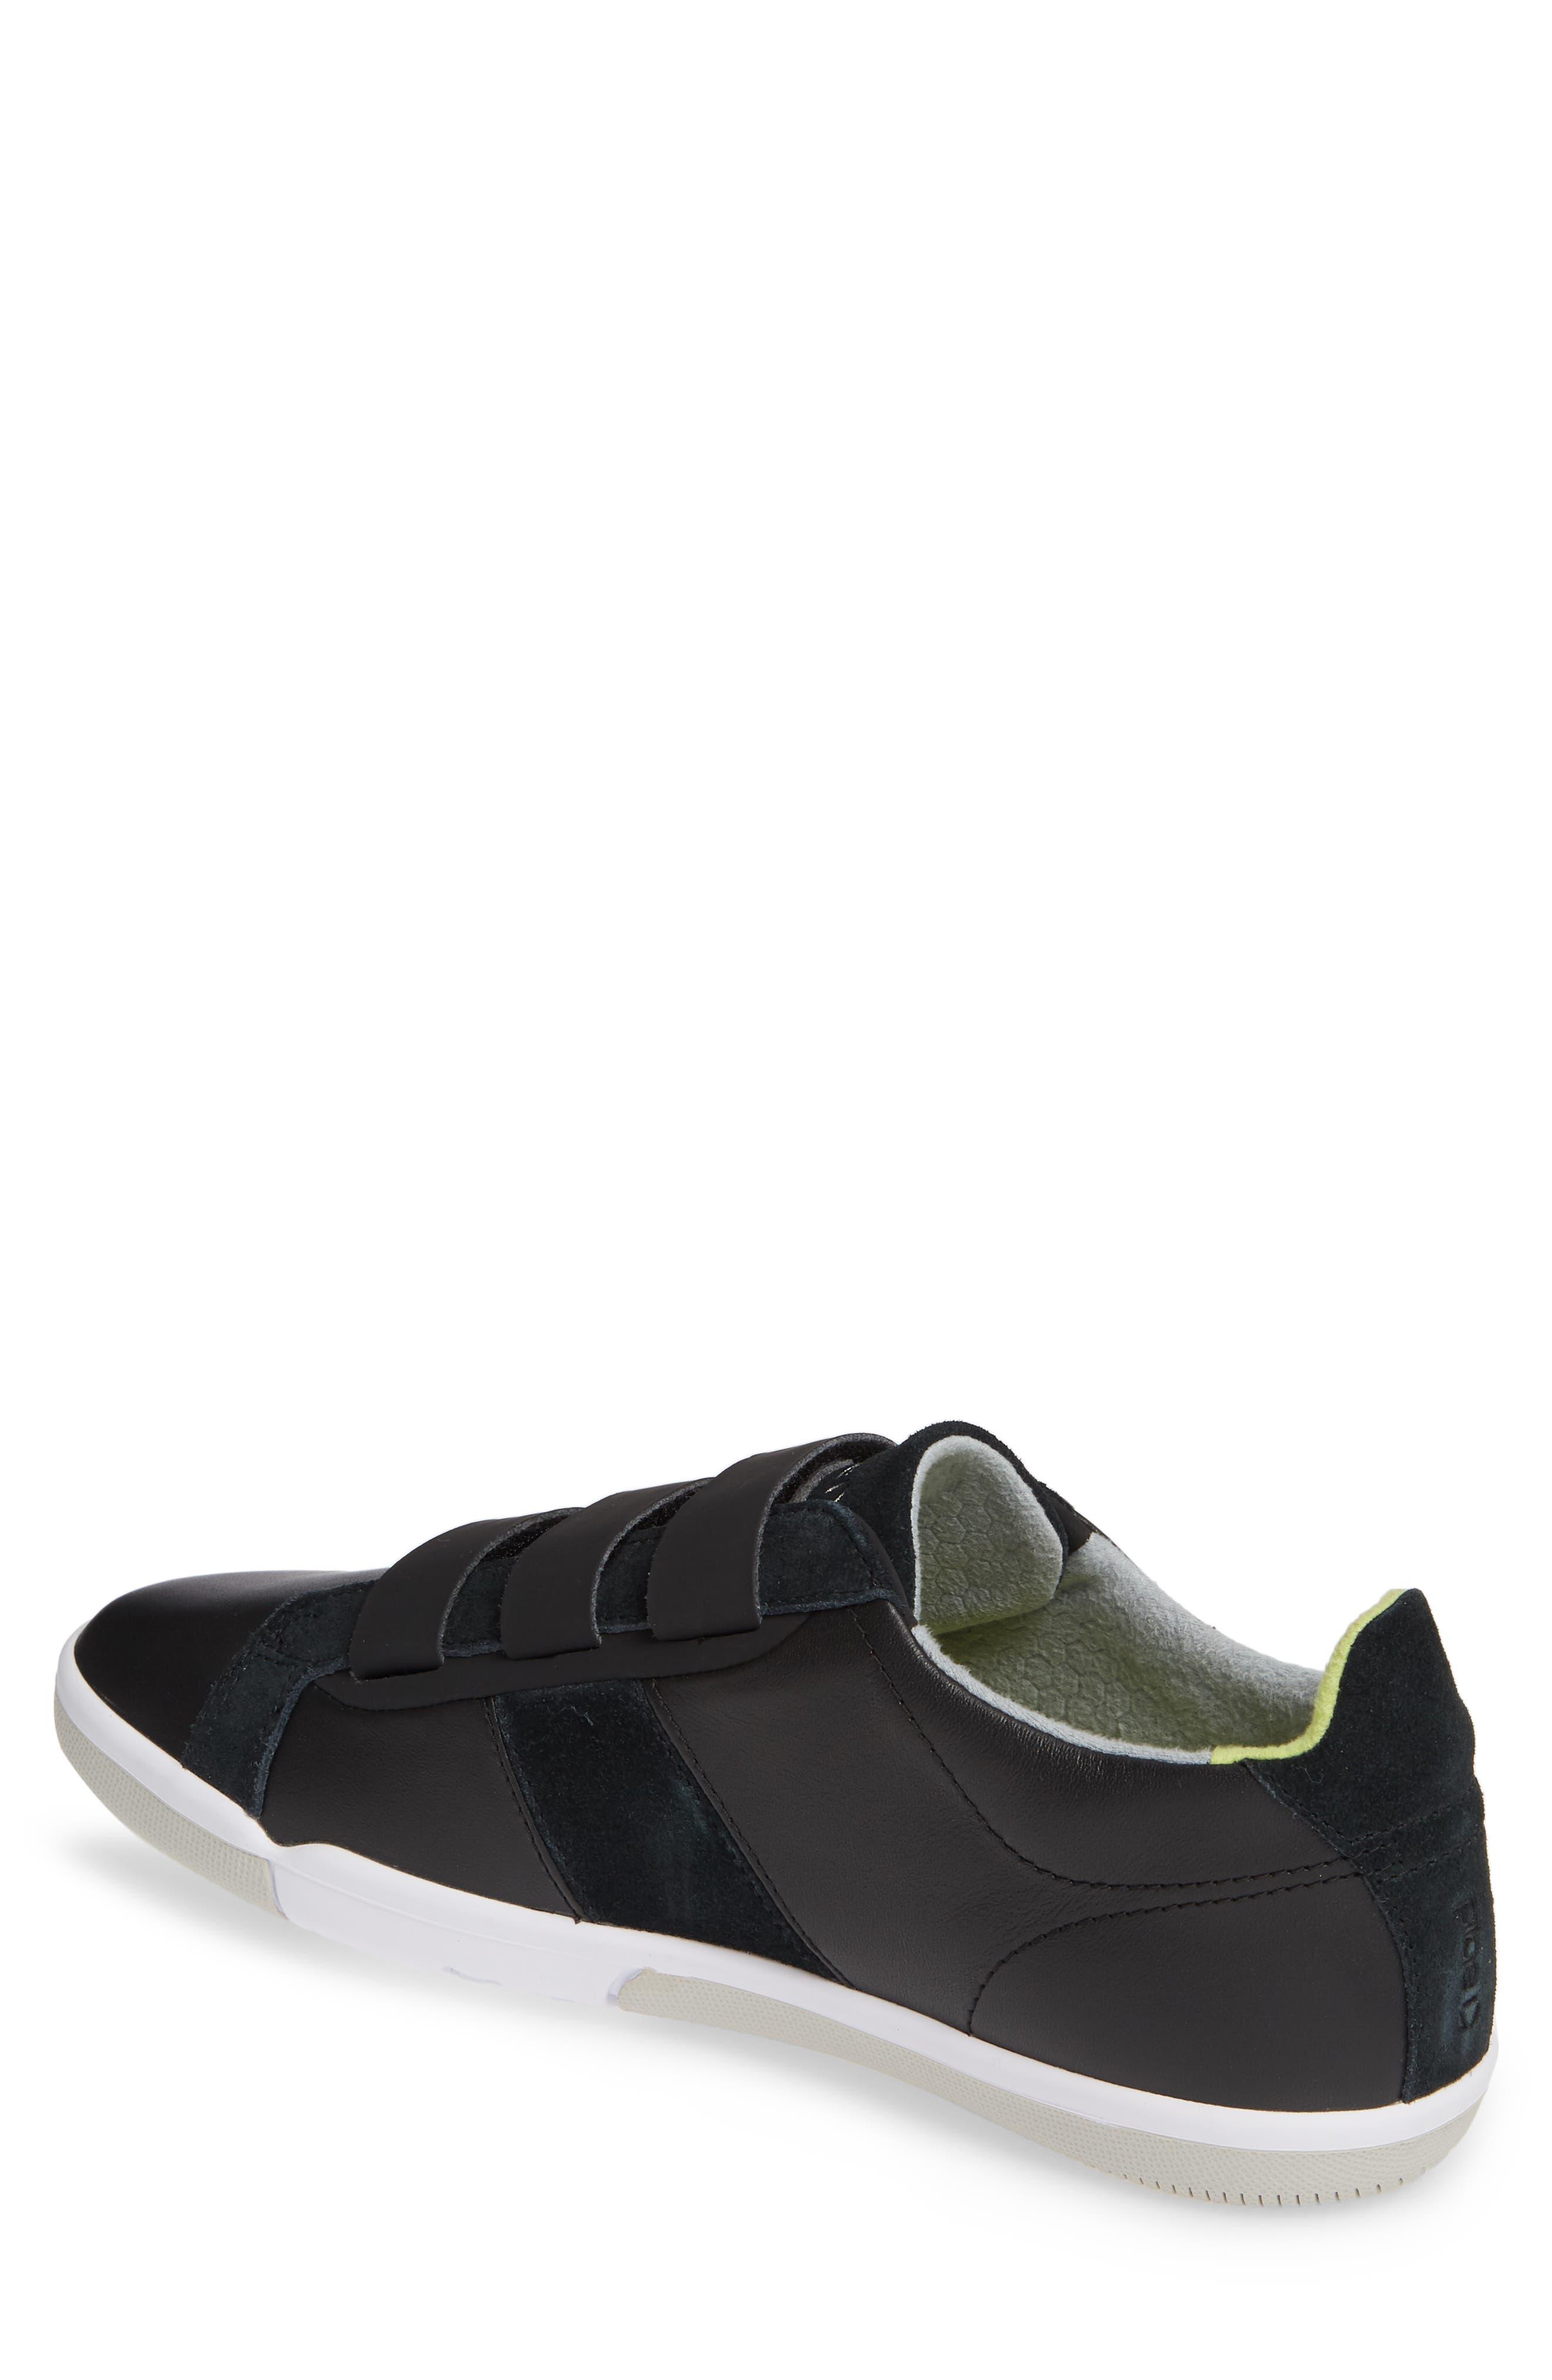 PLAE,                             Larkin Low Top Sneaker,                             Alternate thumbnail 2, color,                             BLACK LEATHER/ SUEDE